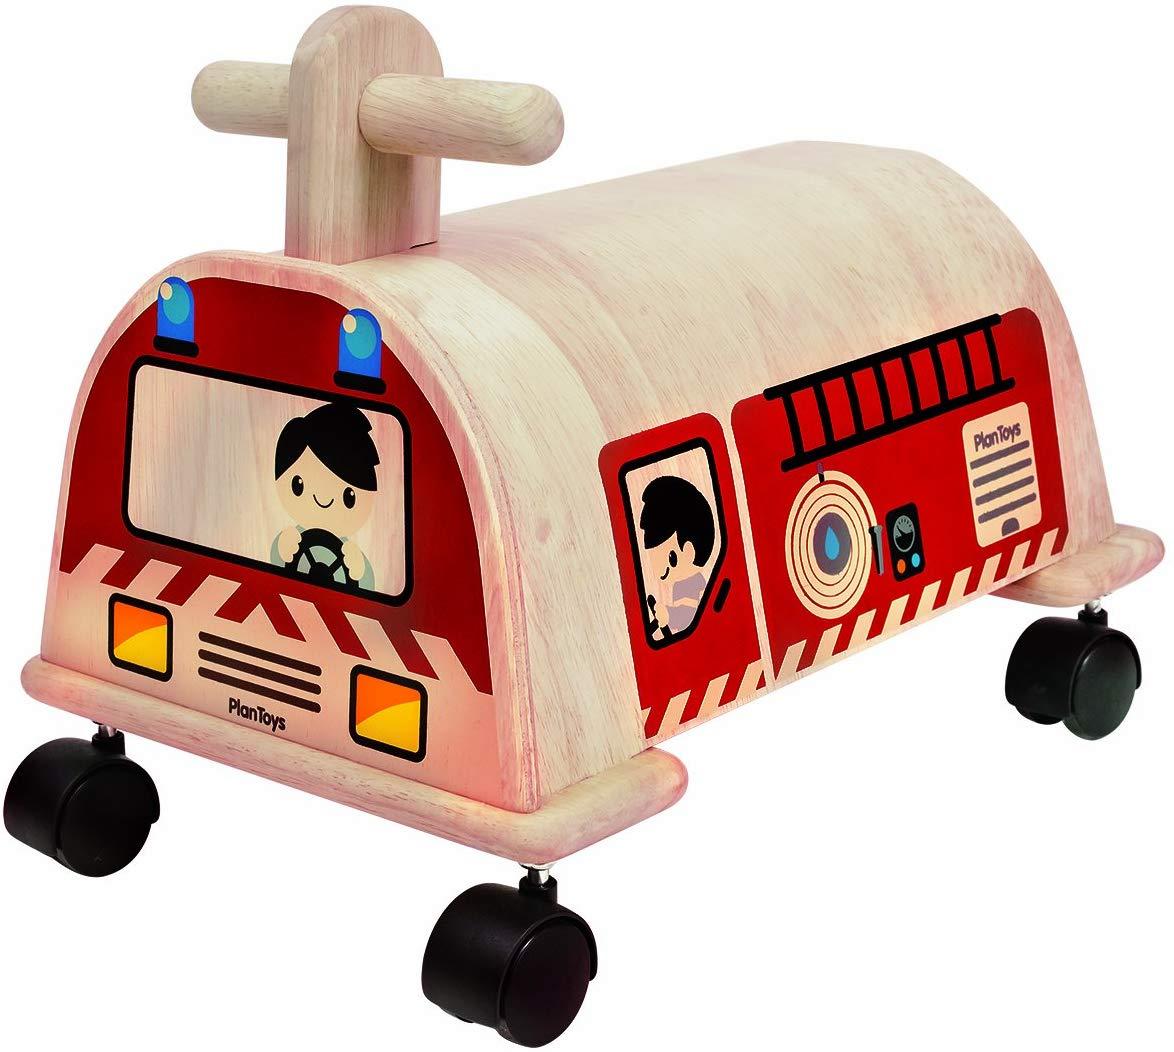 PLANTOYS 3474 乗用消防車デザインと品質に優れた 環境に優しい 木のおもちゃ消防車がテーマの乗用玩具です。商品サイズ:24.9x30.5x38.1cm対象性別 :男女共用対象年齢 :1歳から